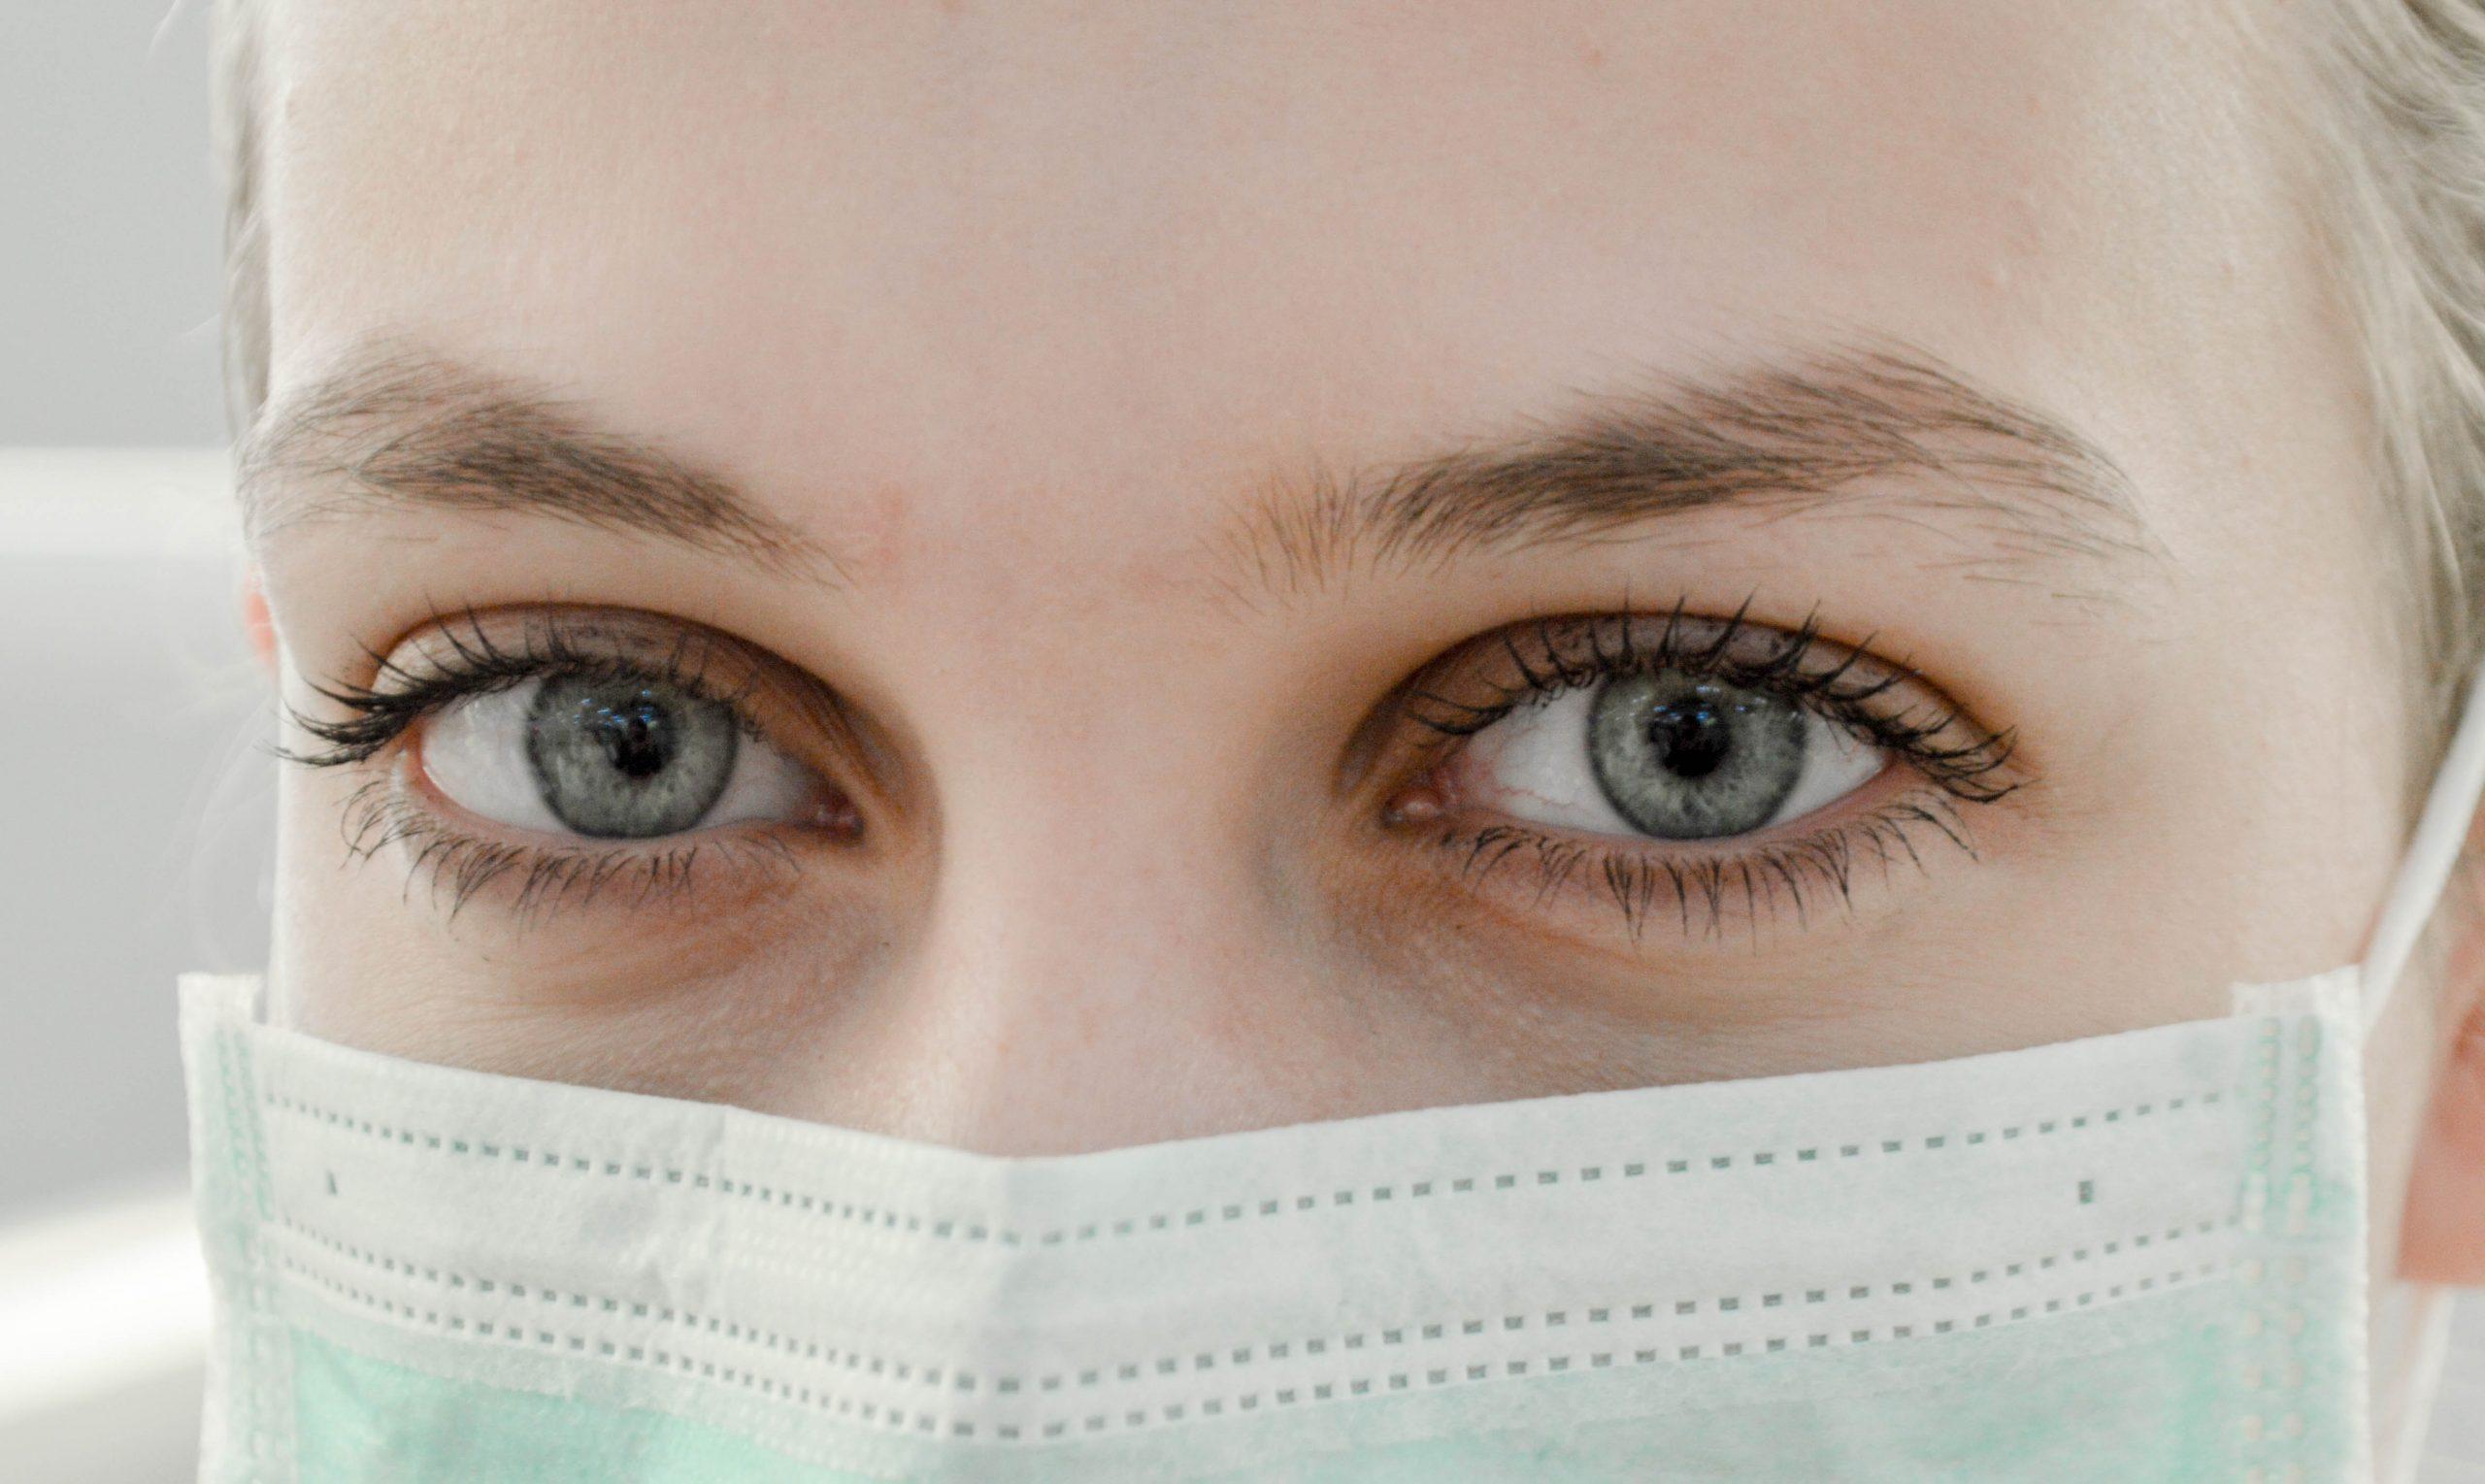 nurses covid 19